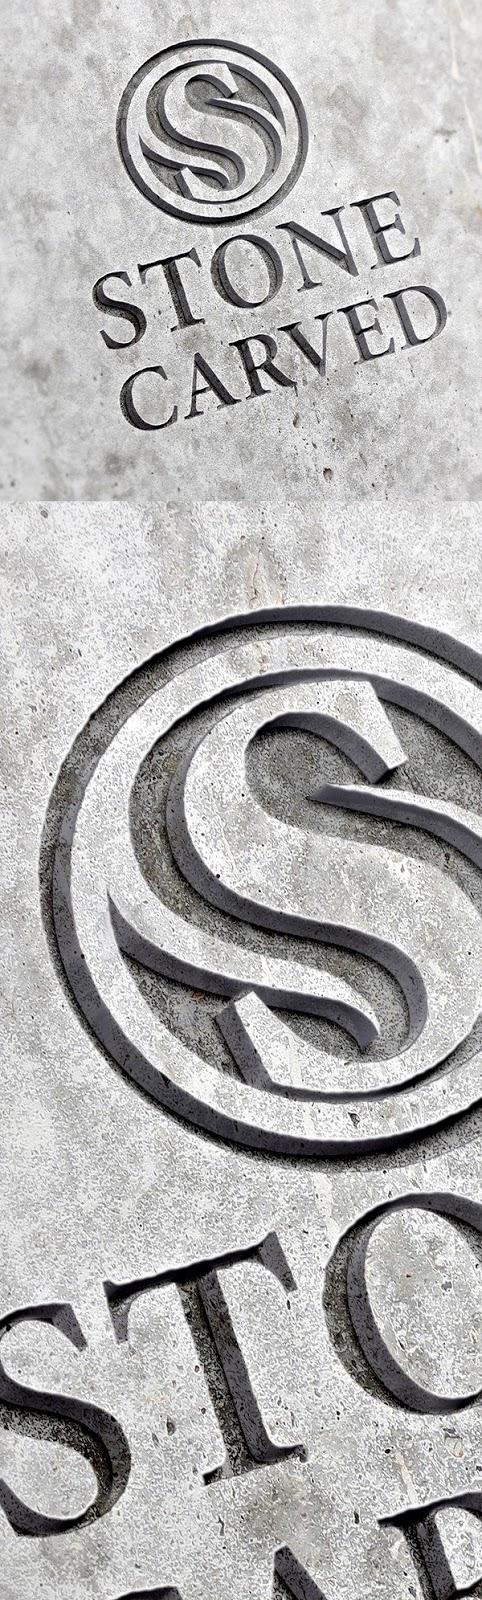 Download Free Mockup PSD 2018 - Free Carved Stone Logo Mockup PSD